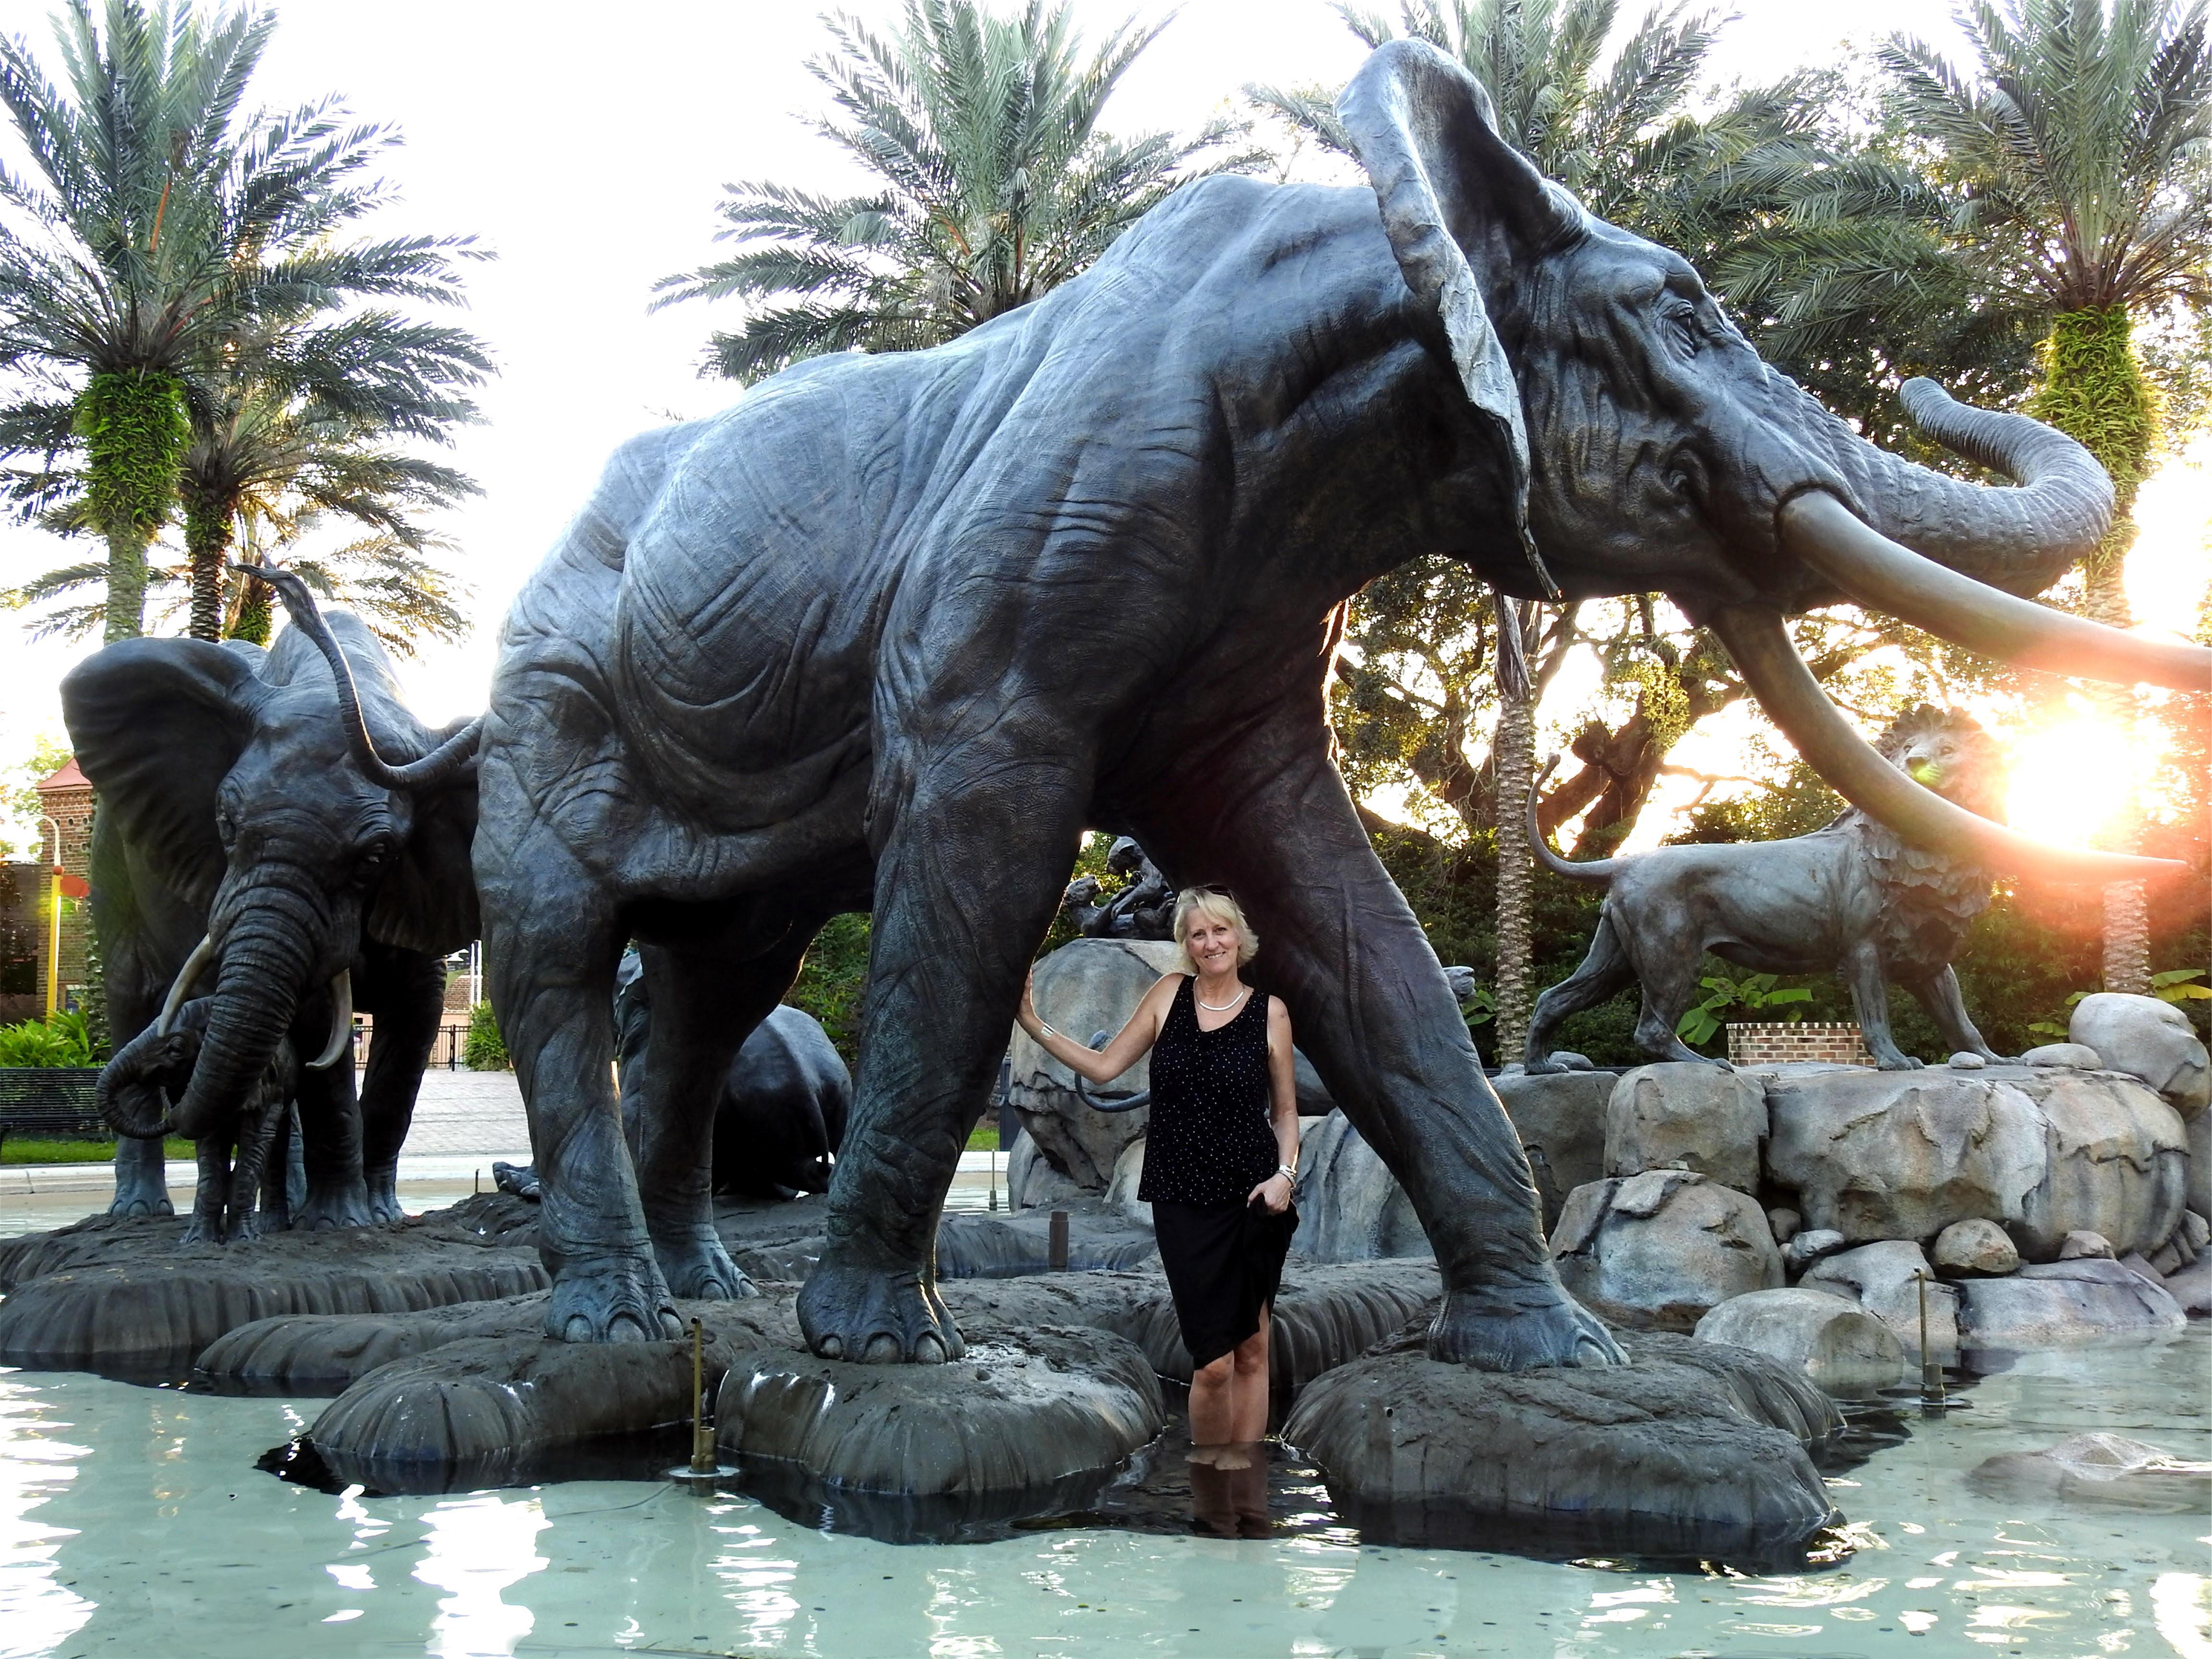 Juveniles MonumentThe Audubon Zoo Sculpture ProjectThe Elephant Family -